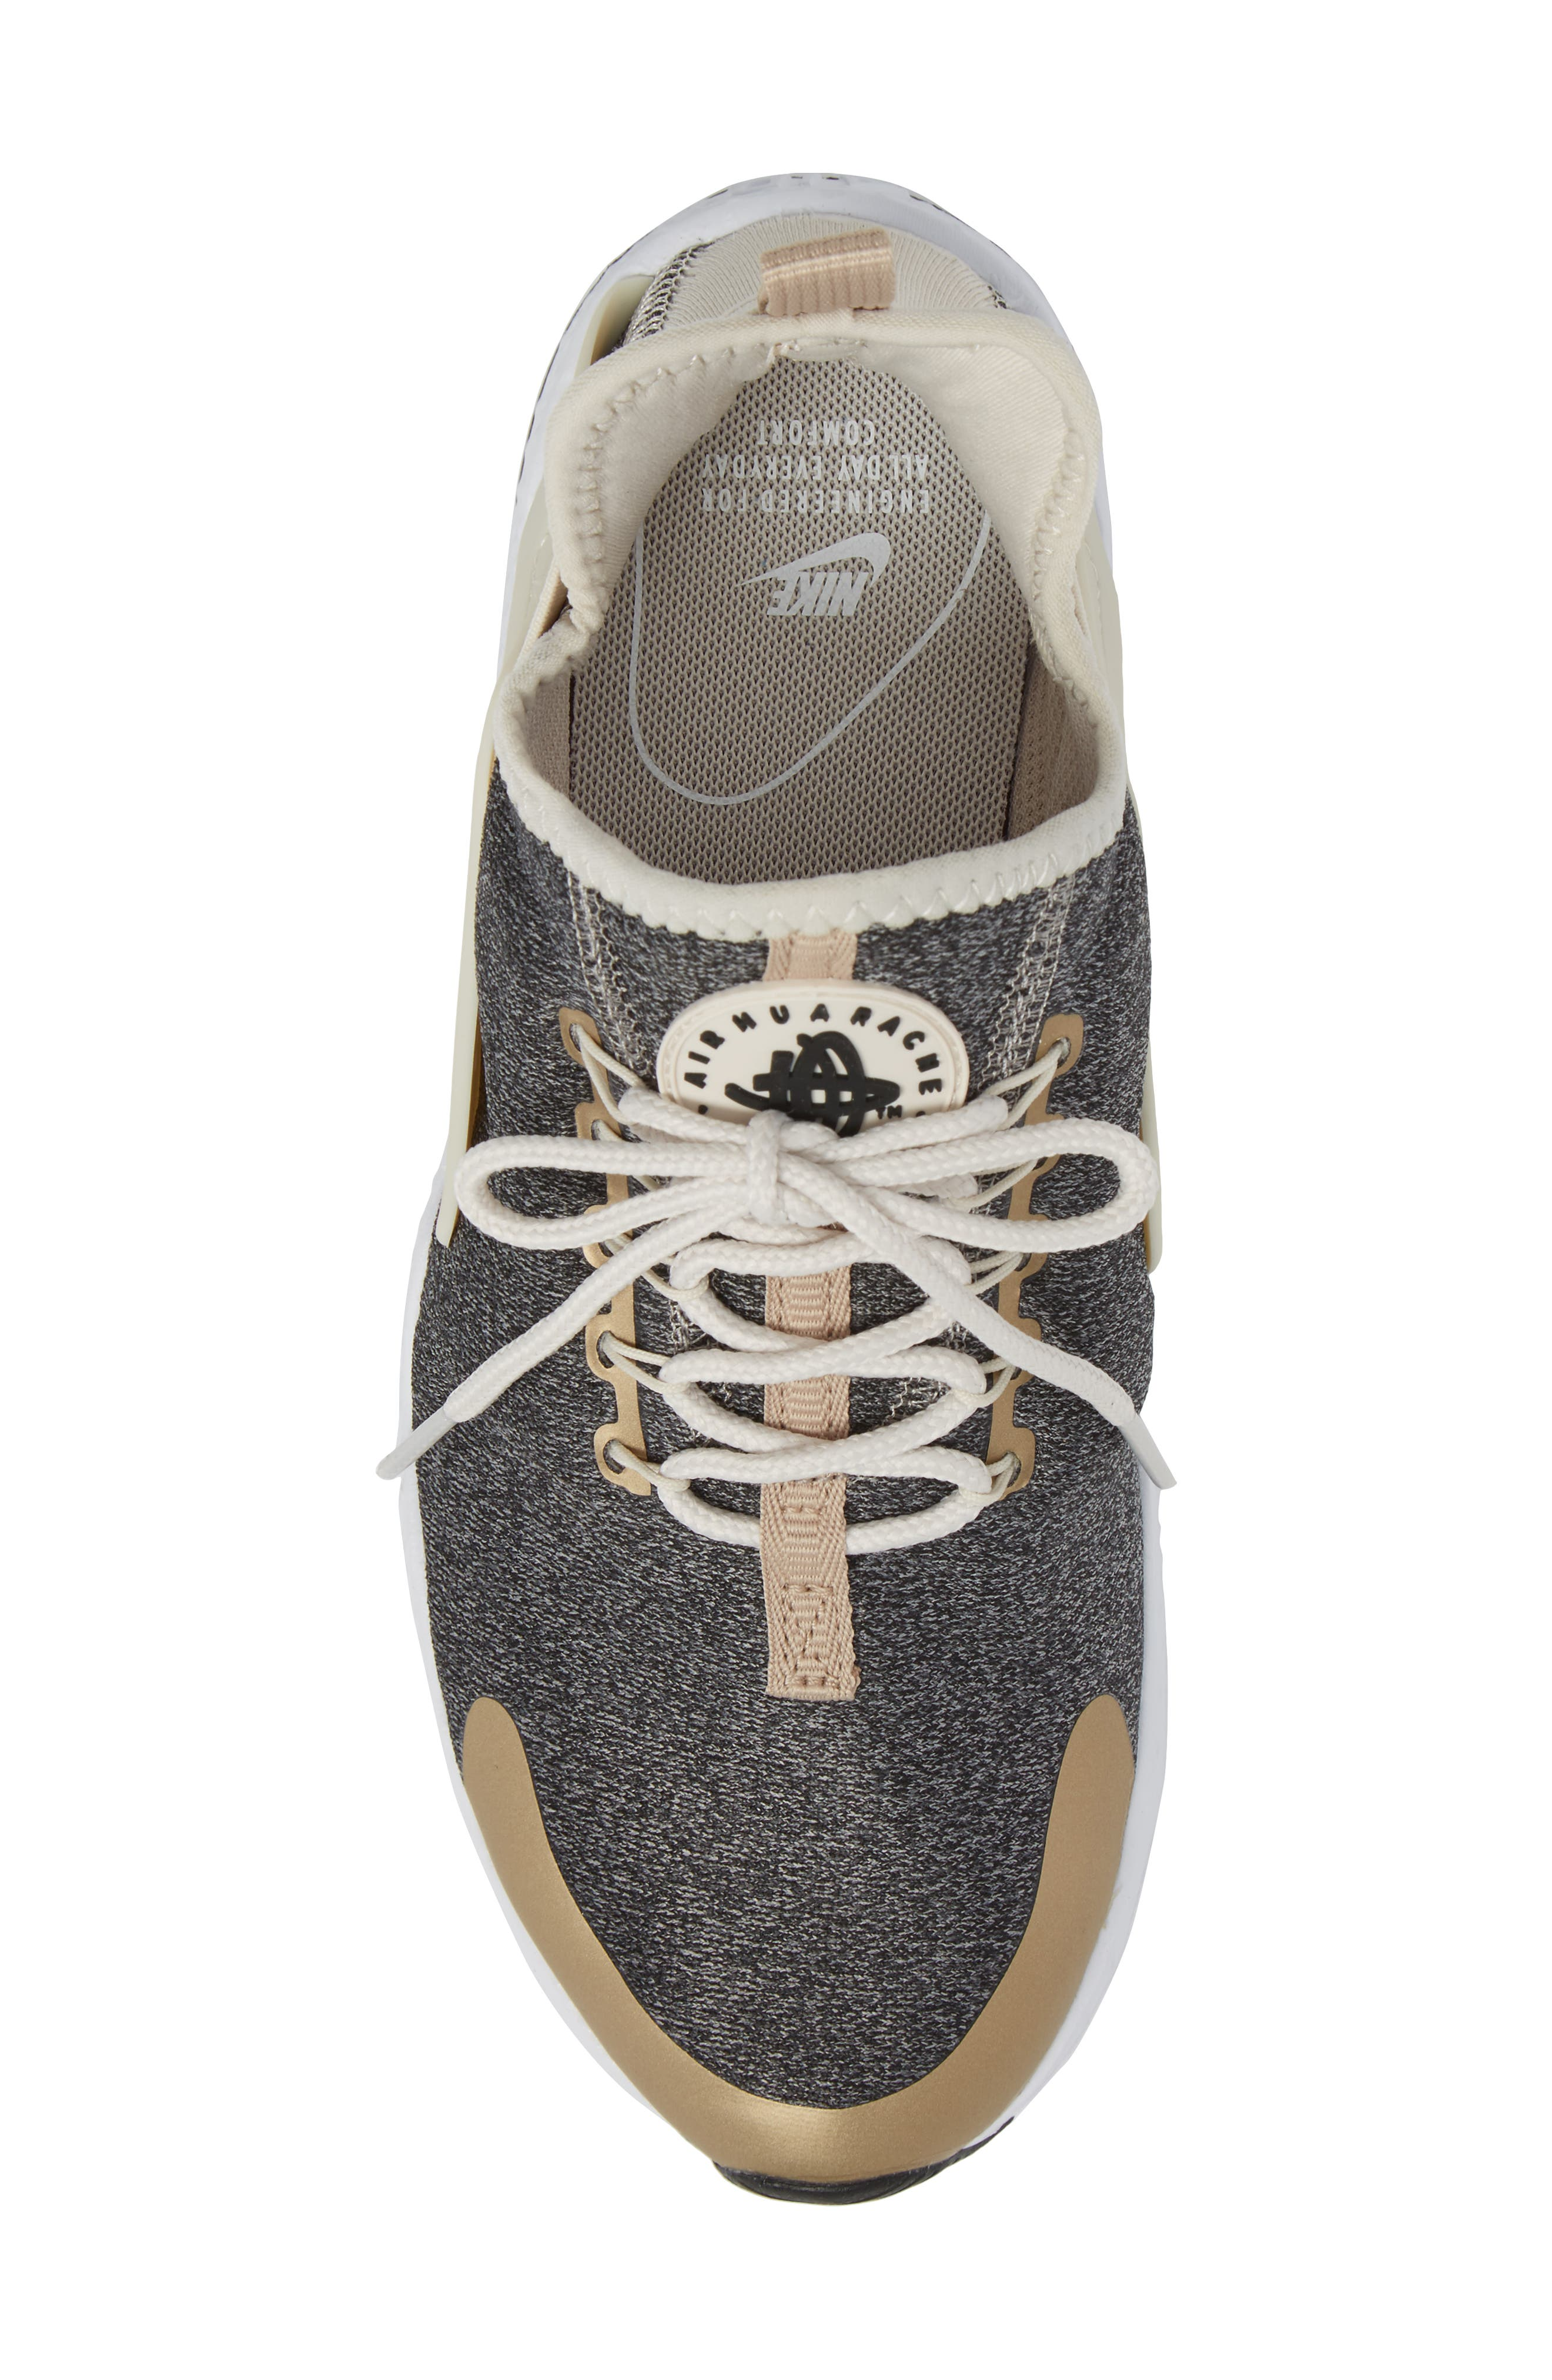 NIKE,                             'Air Huarache Run Ultra SE' Sneaker,                             Alternate thumbnail 5, color,                             285